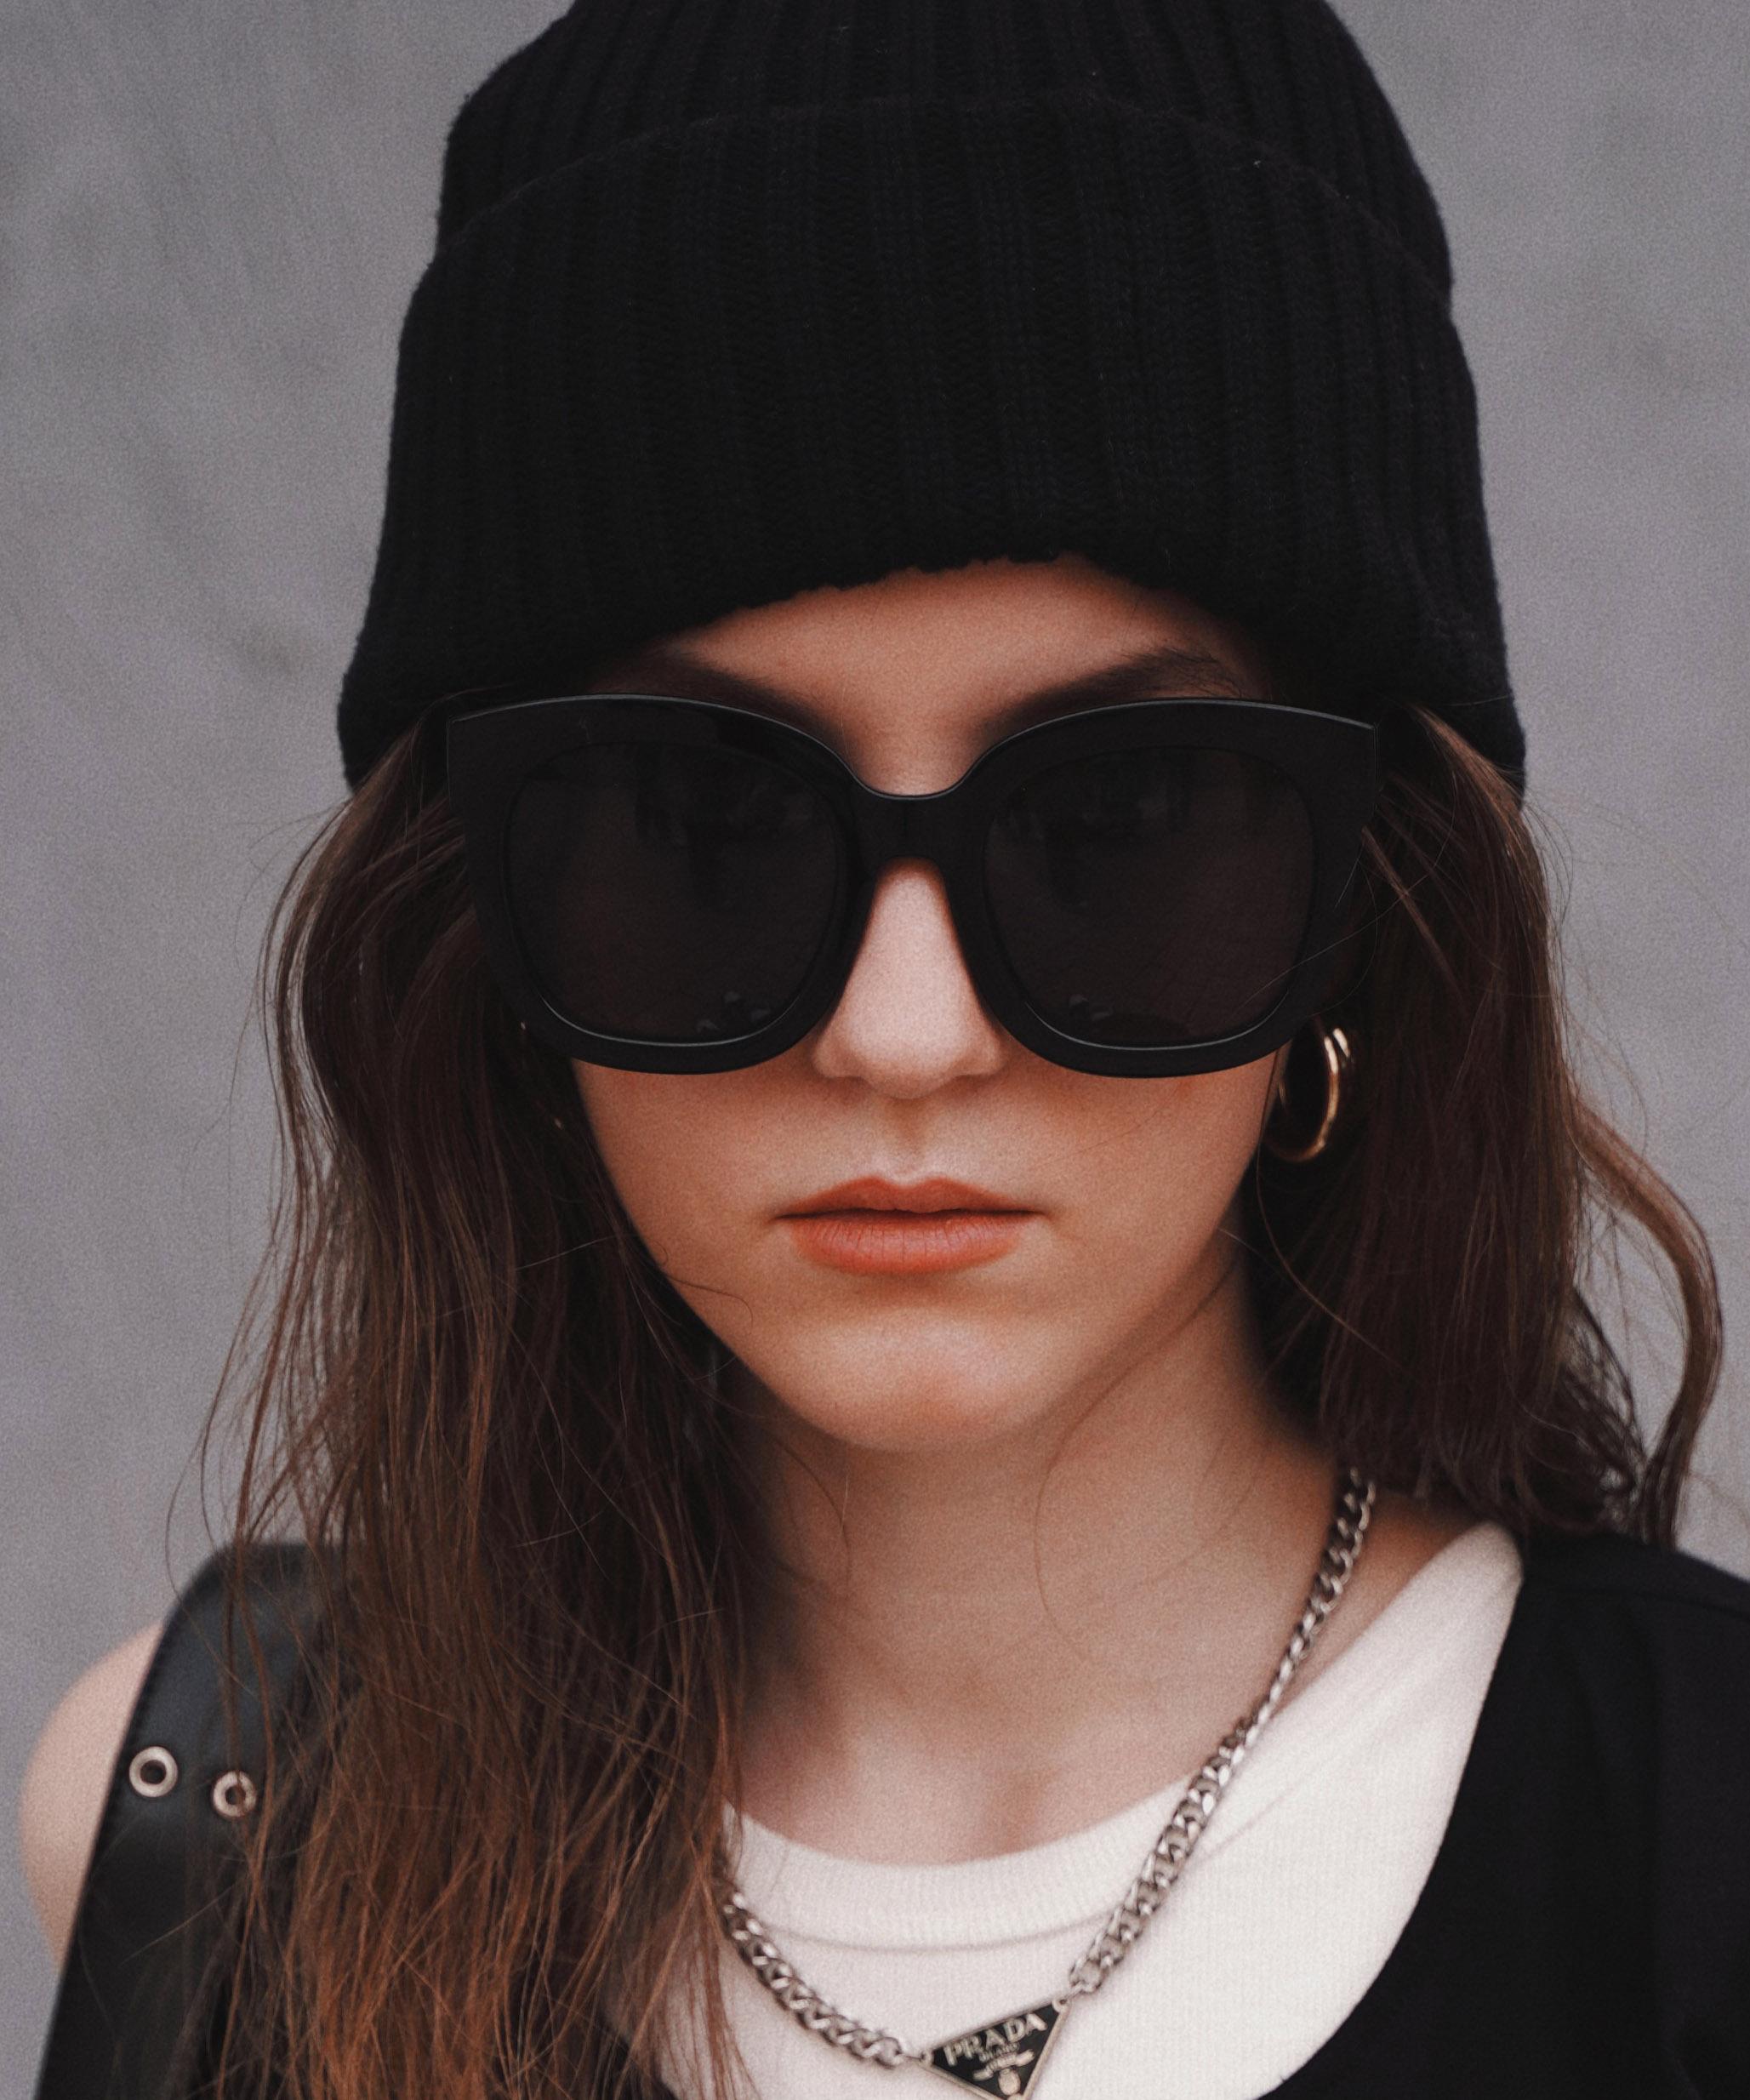 Deformation bulky sunglasses